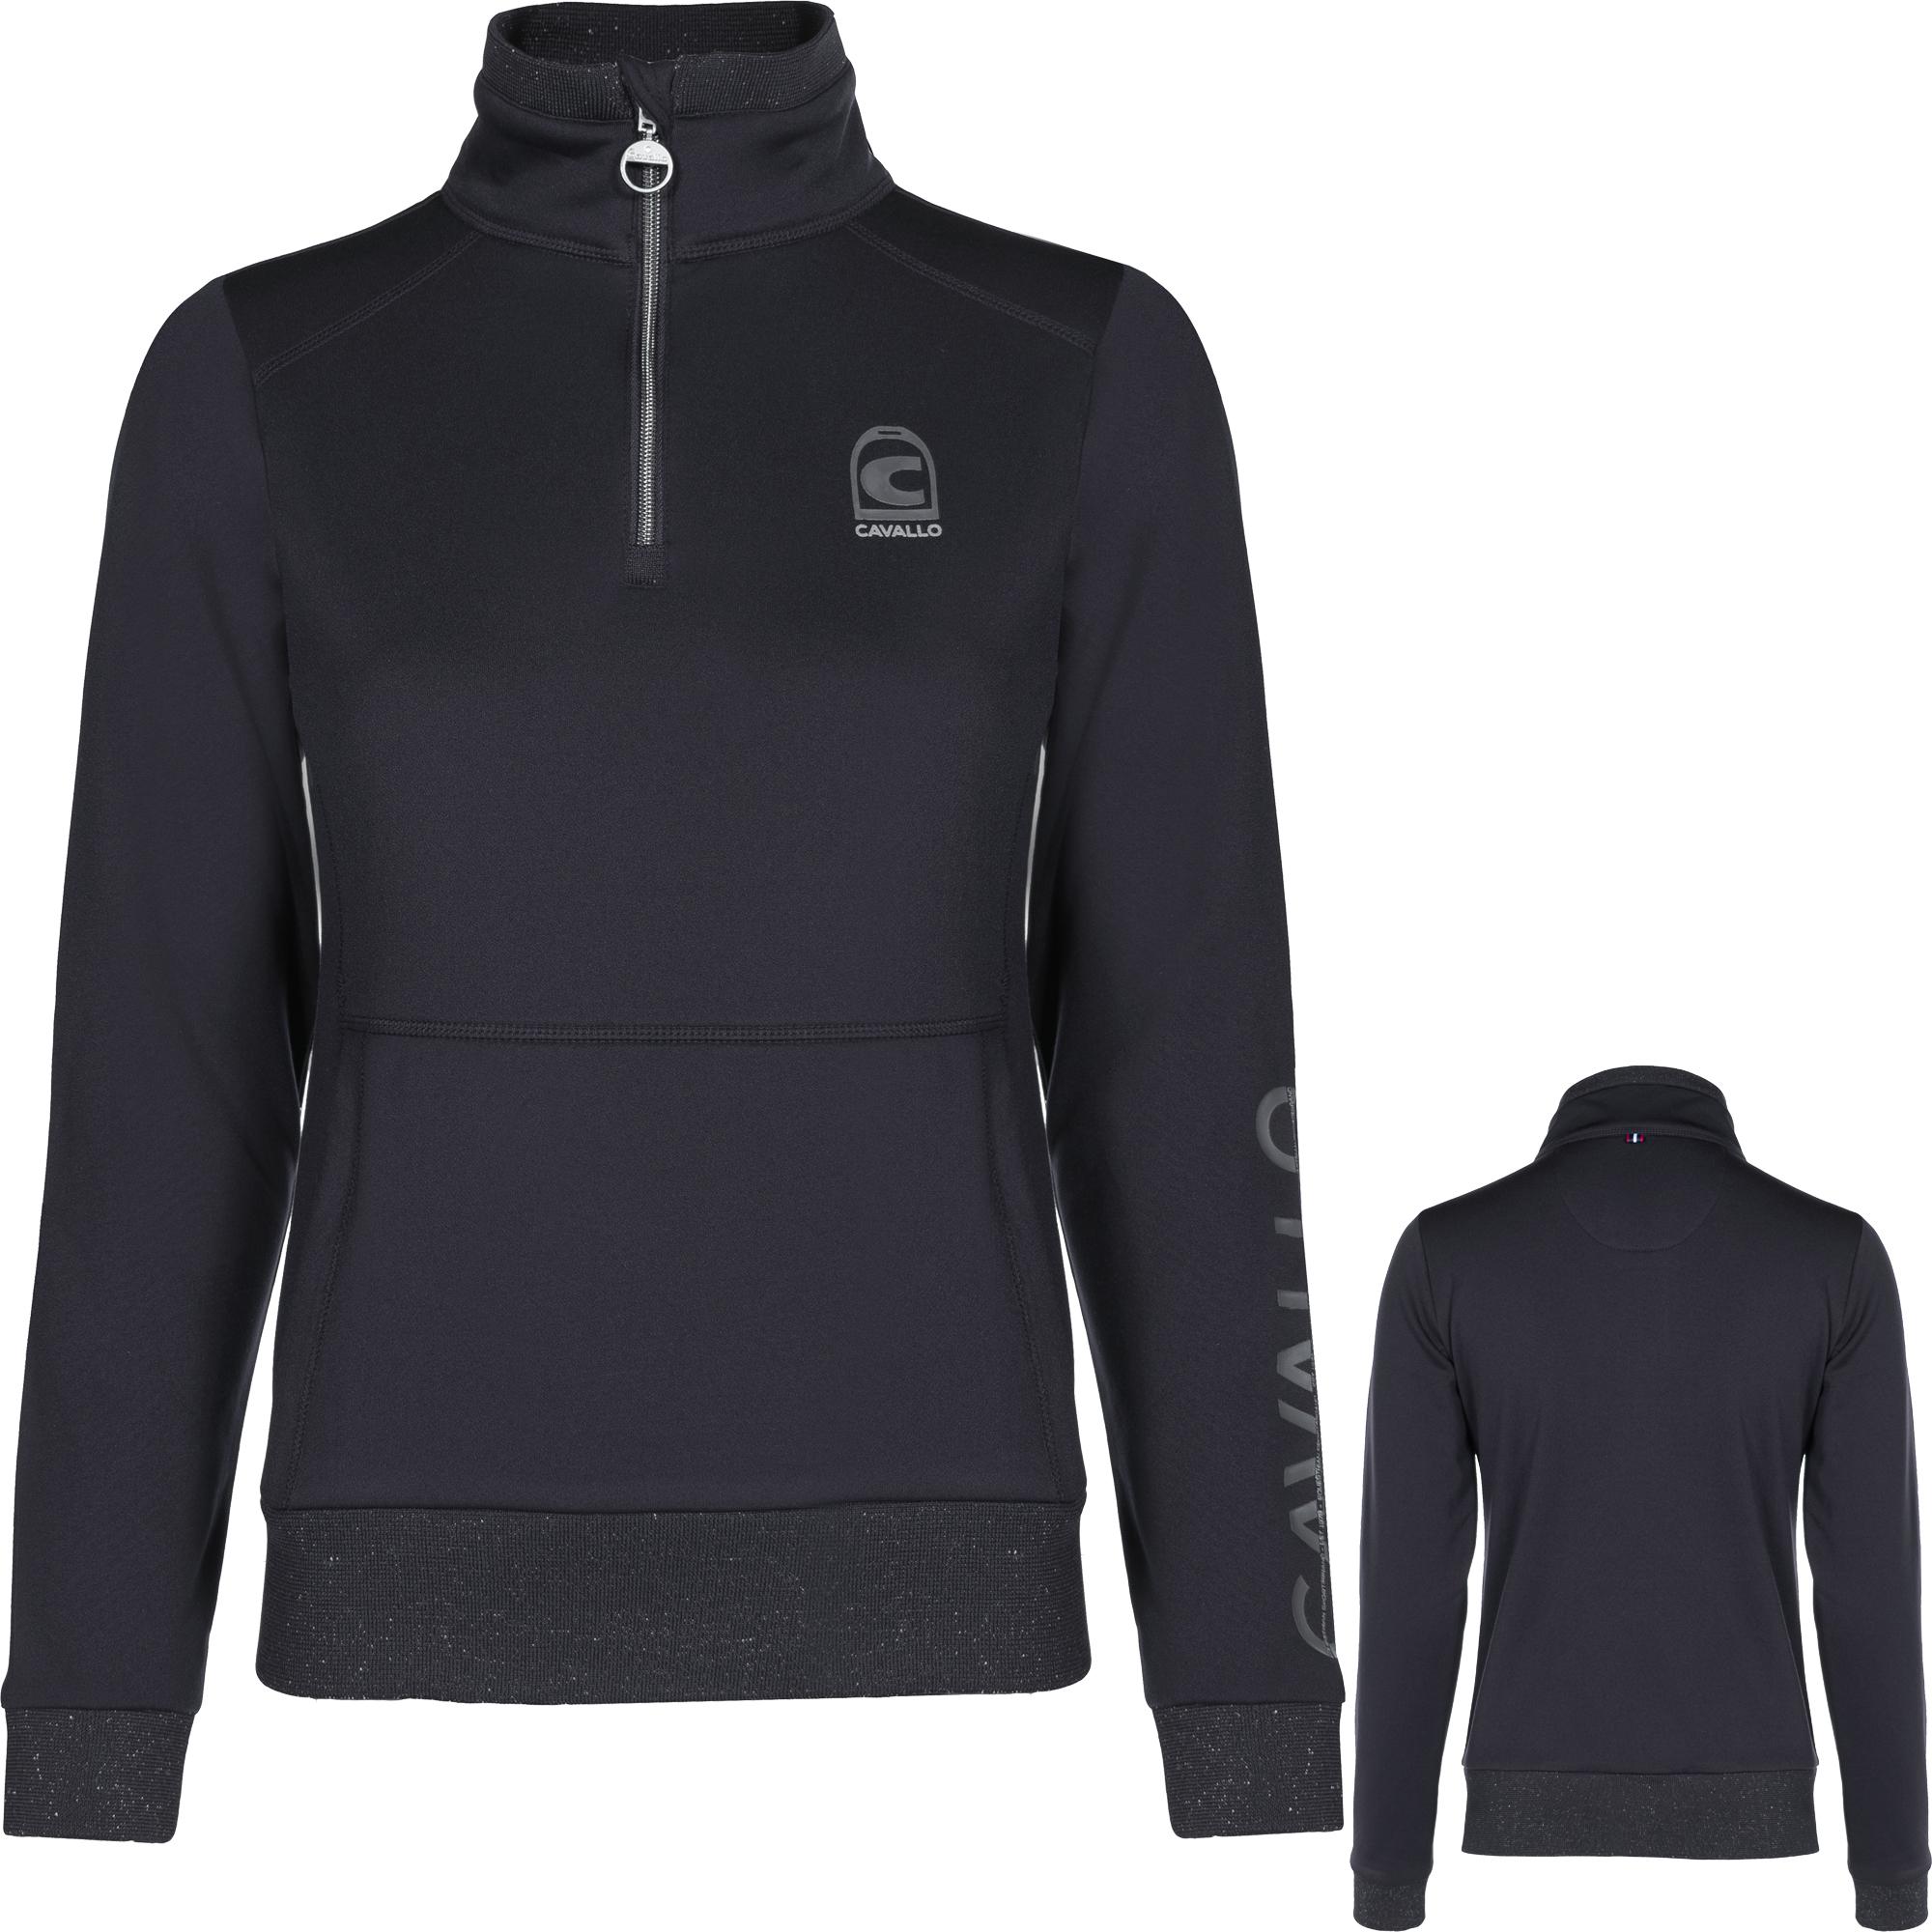 Cavallo Damen Sweatshirt Bela in black